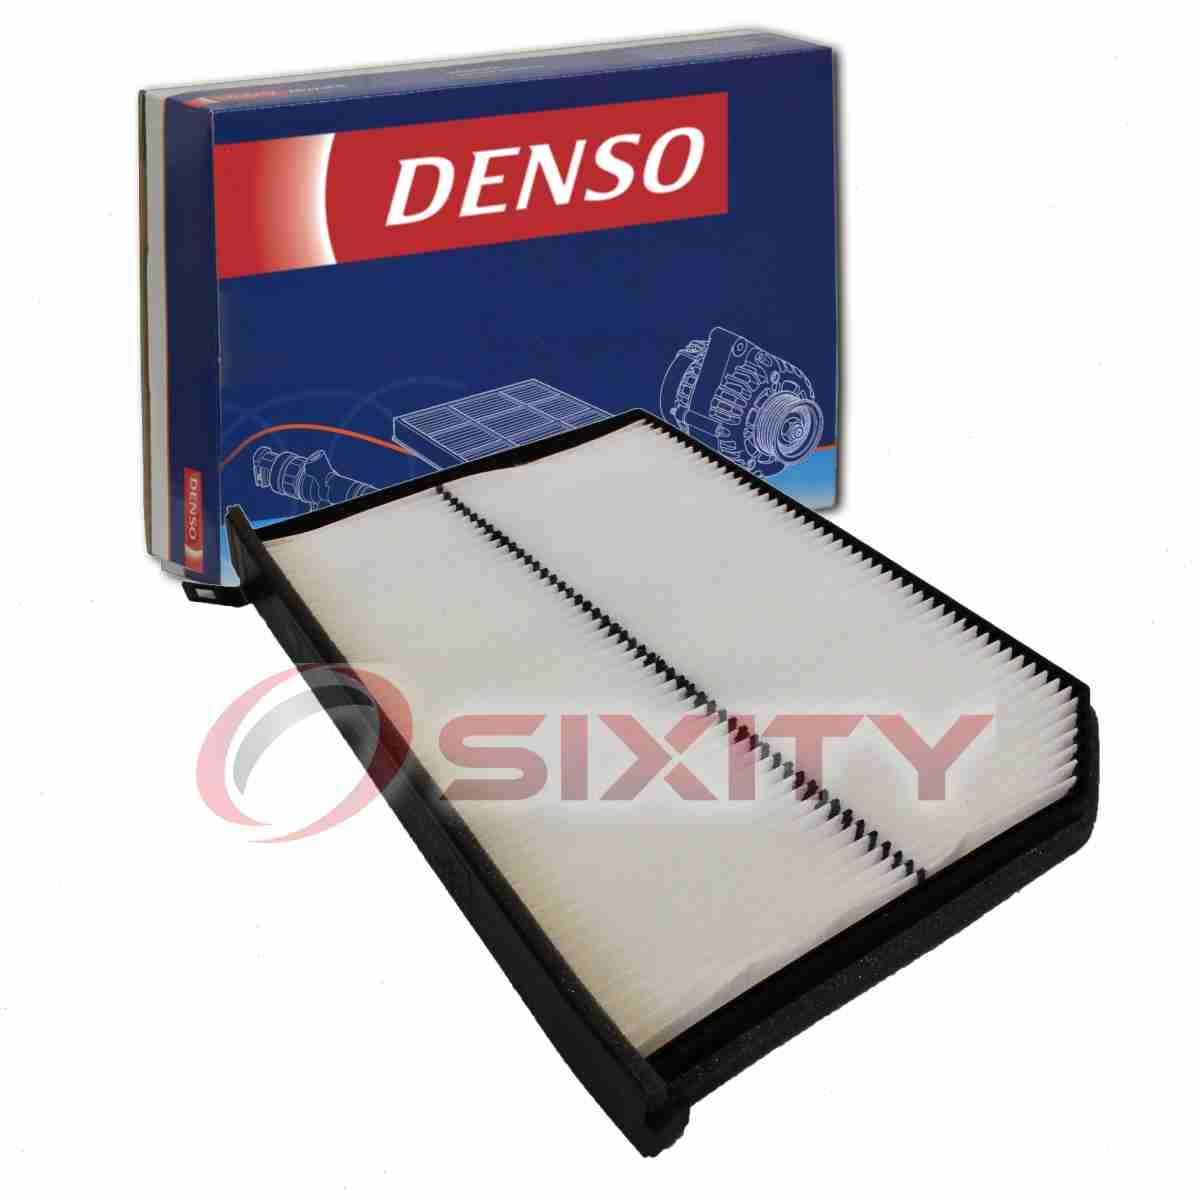 Denso Cabin Air Filter for Toyota Camry 2.4L L4 3.0L 3.3L V6 2002-2006 HVAC ls